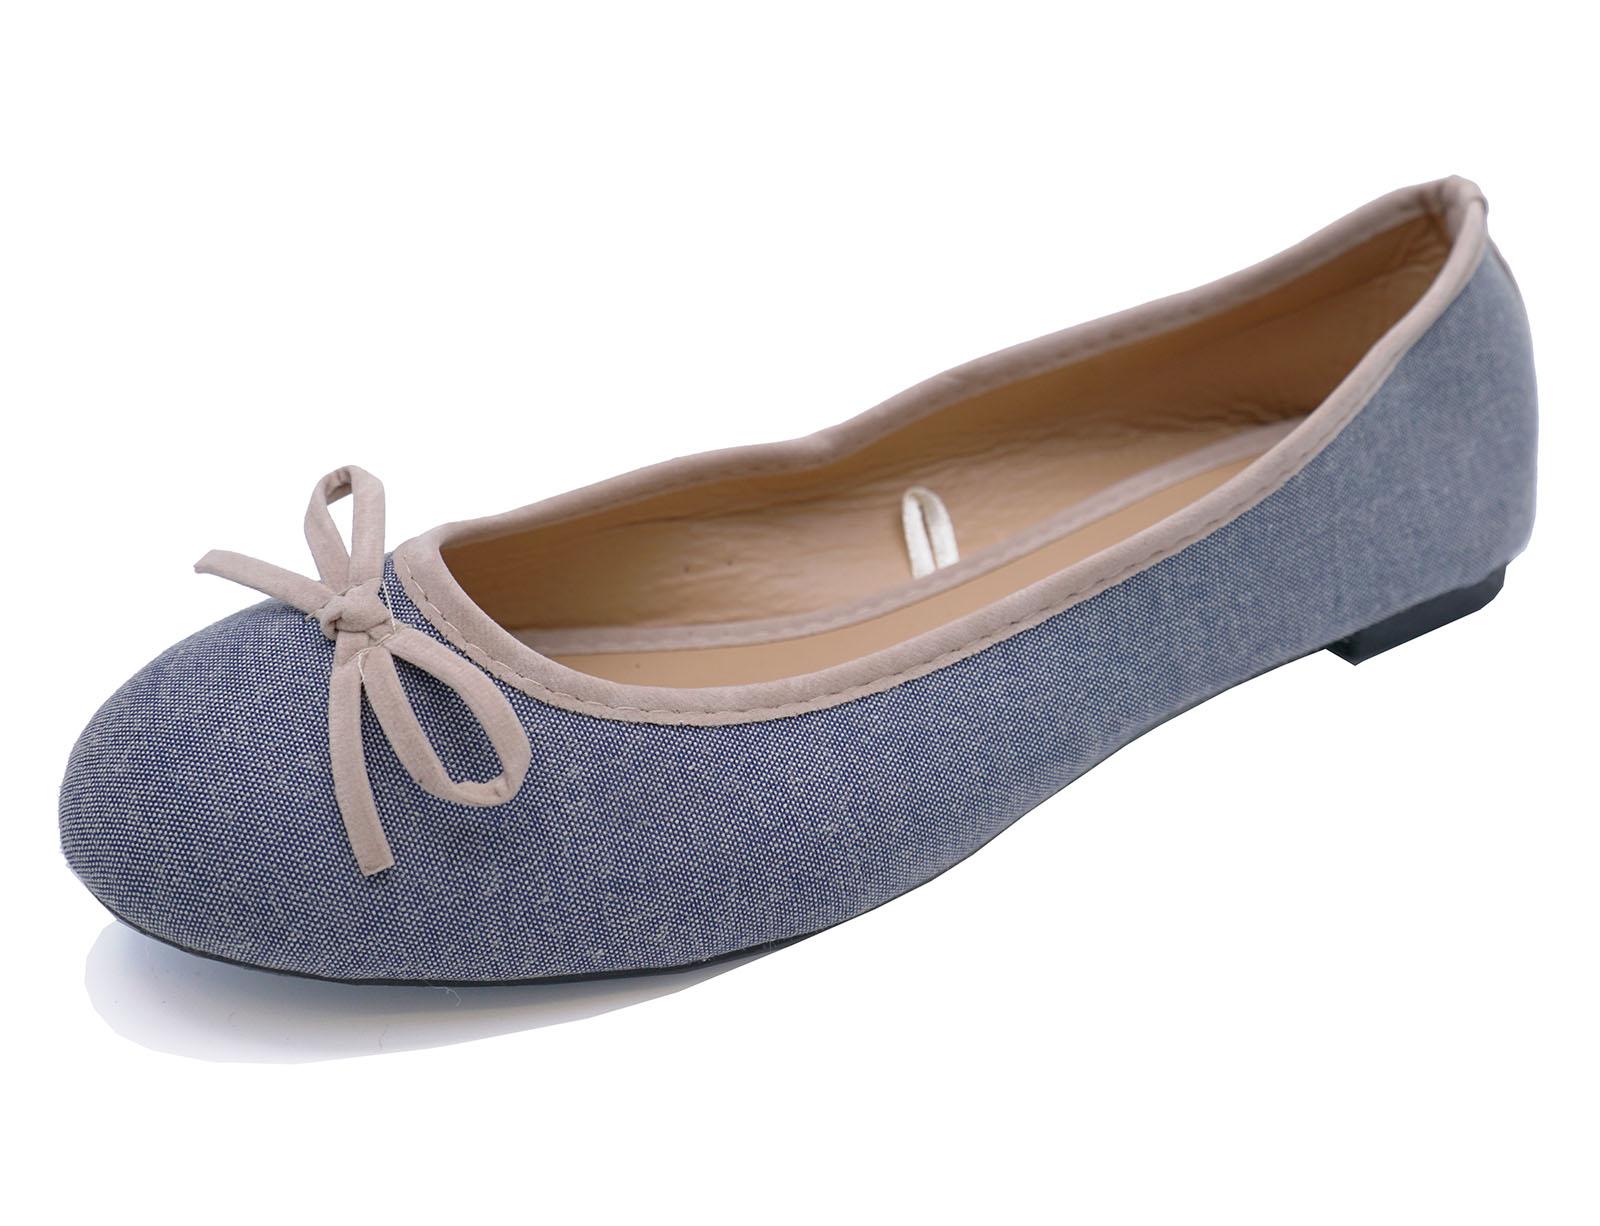 LADIES FLAT BLUE CANVAS SLIP-ON SHOES COMFY BALLET BALLERINA CASUAL PUMPS UK 3-8 | EBay